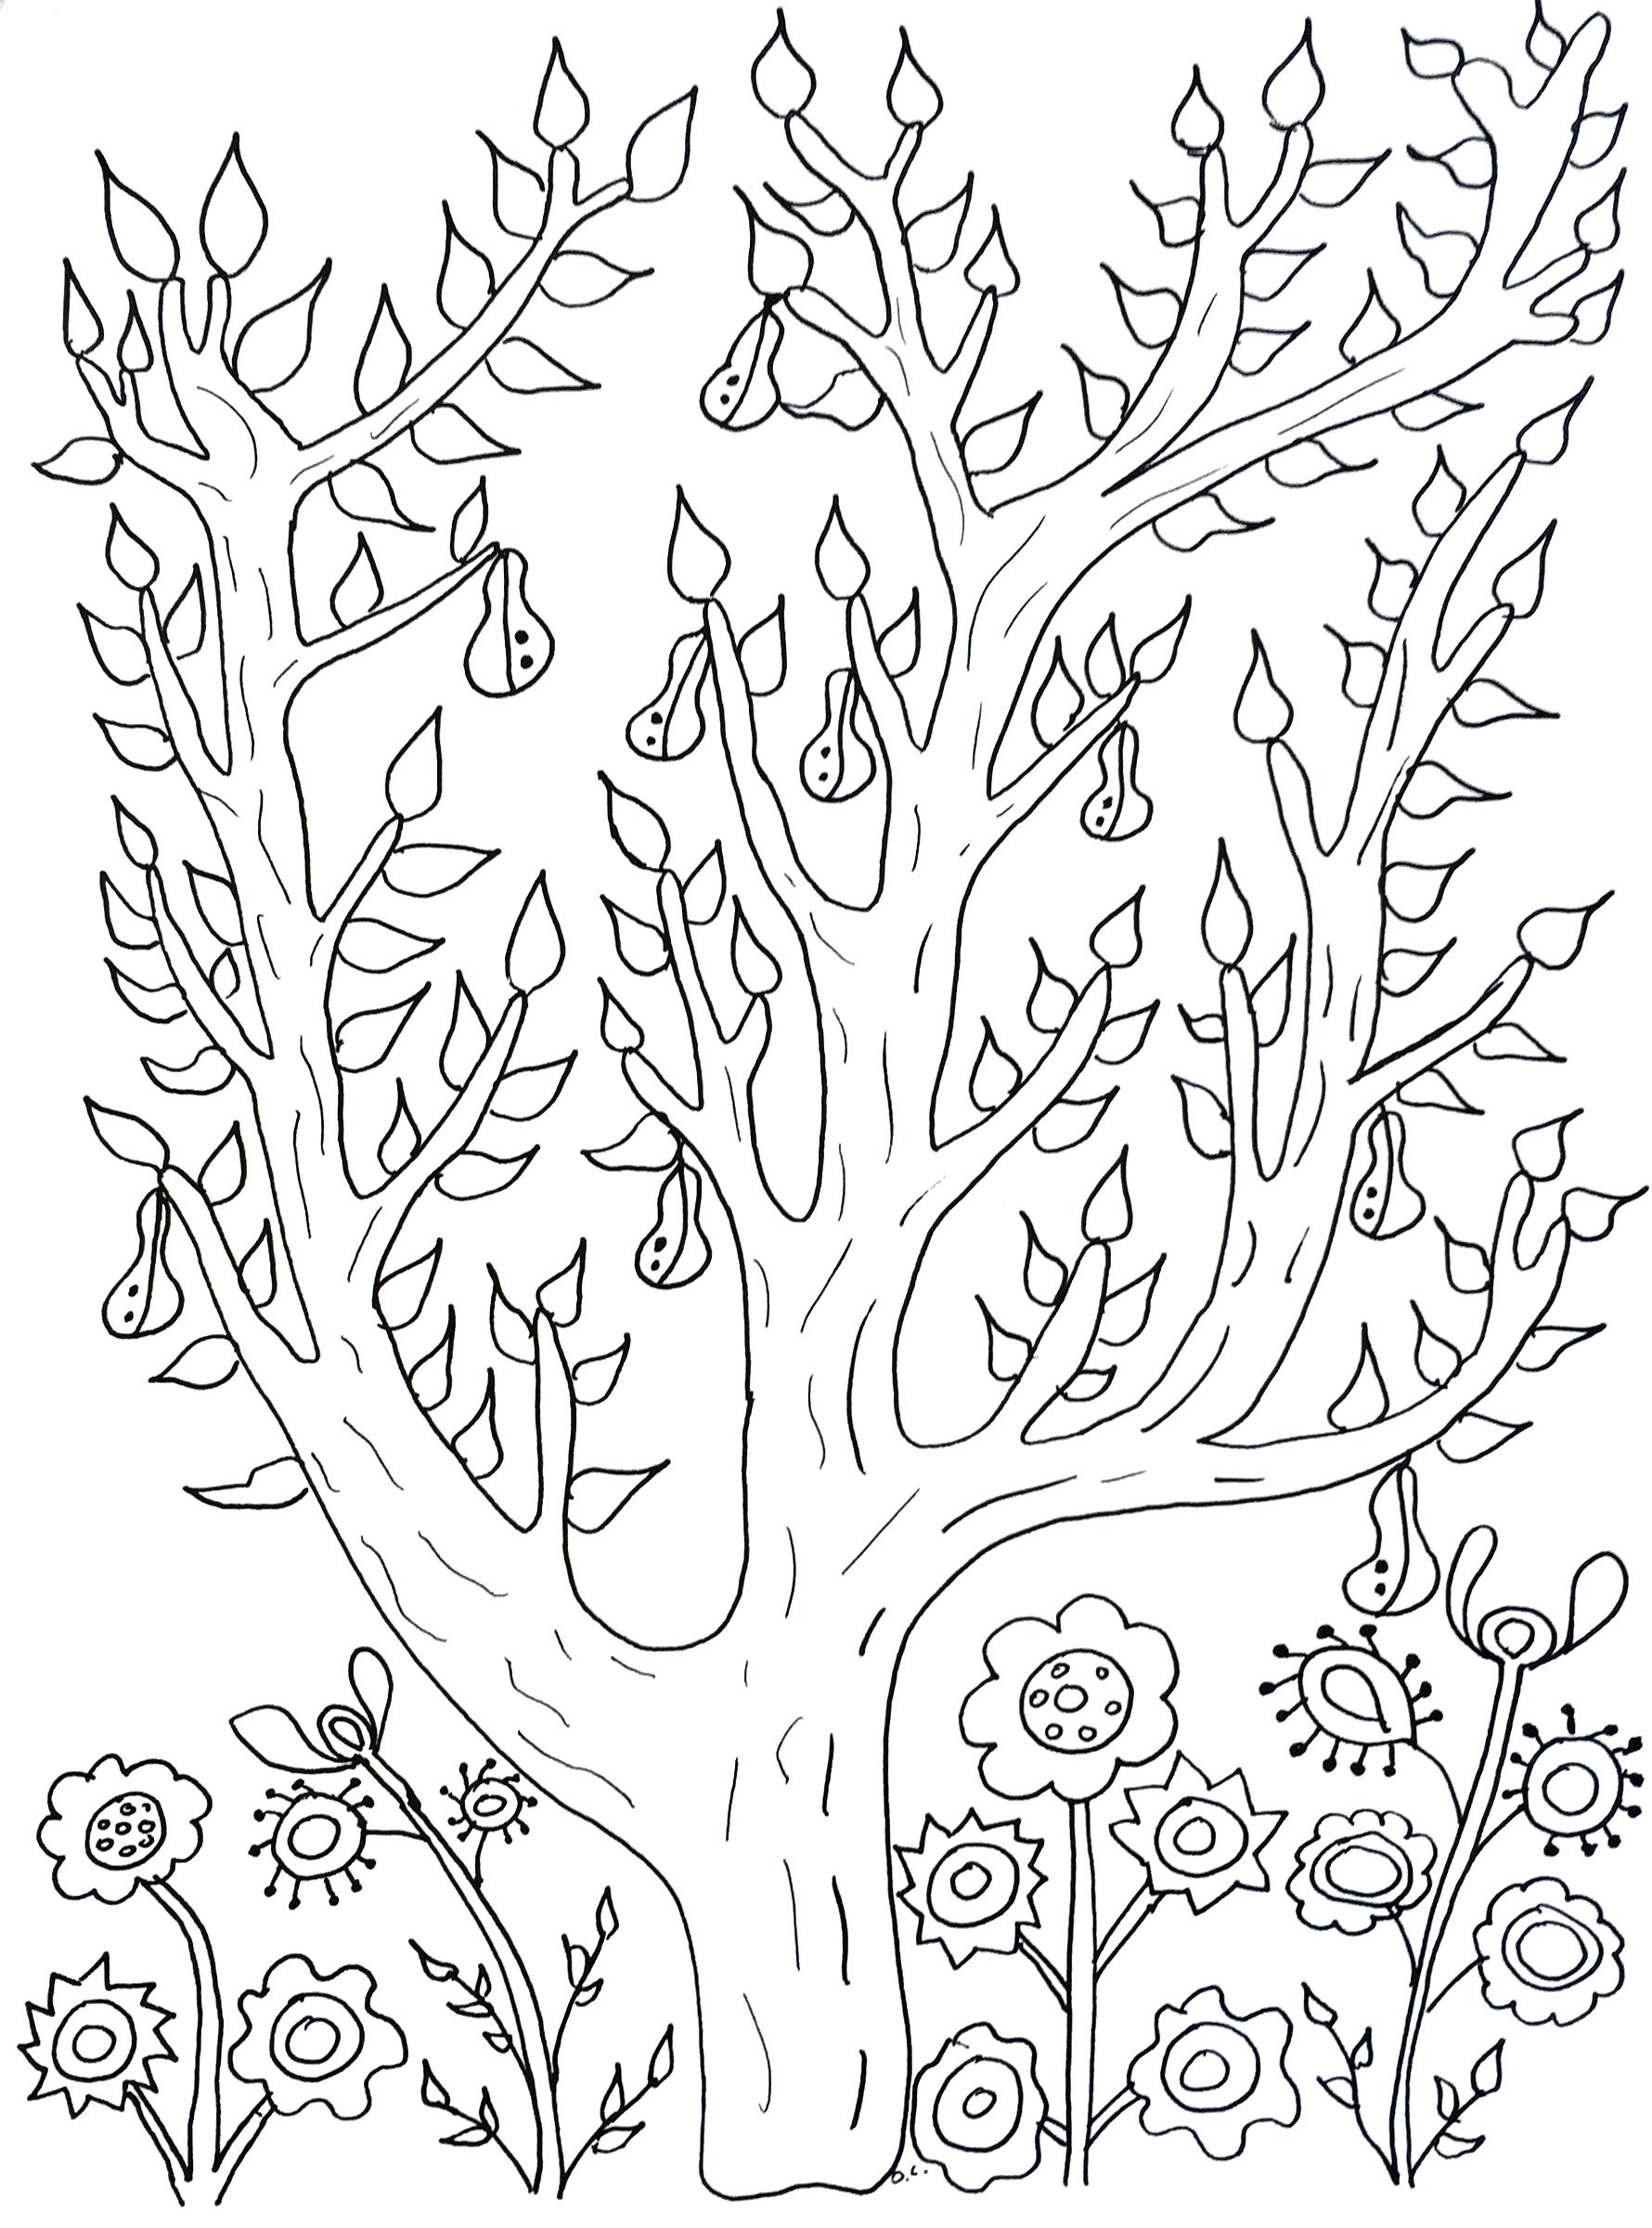 Blumen vegetation 99686